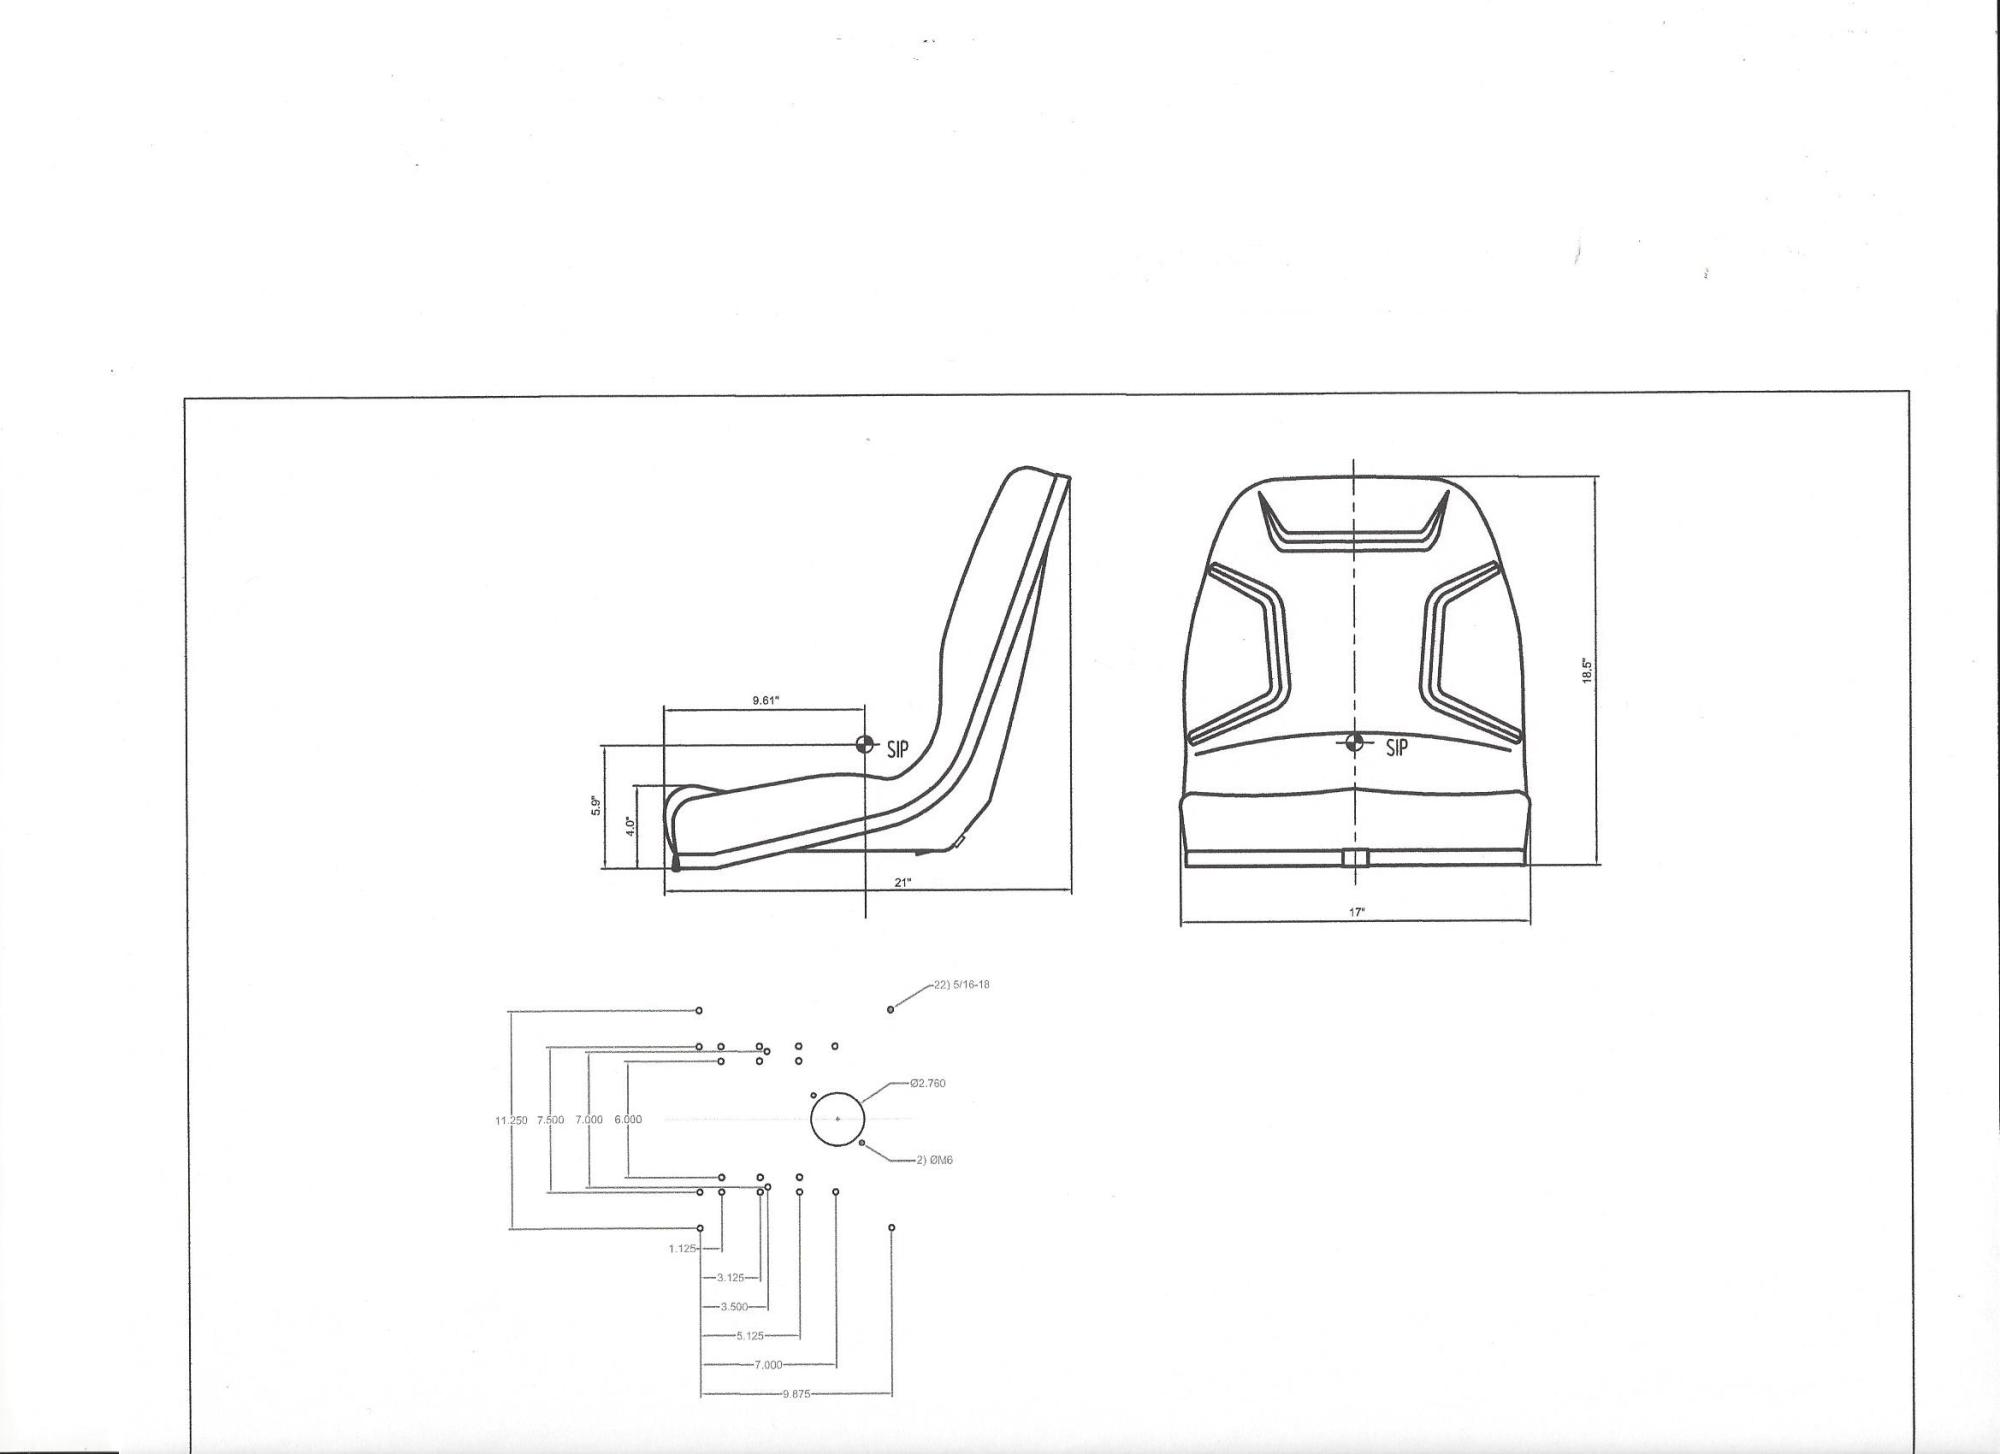 hight resolution of seat massey ferguson 210 220 1020 1030 1035 1040 1140